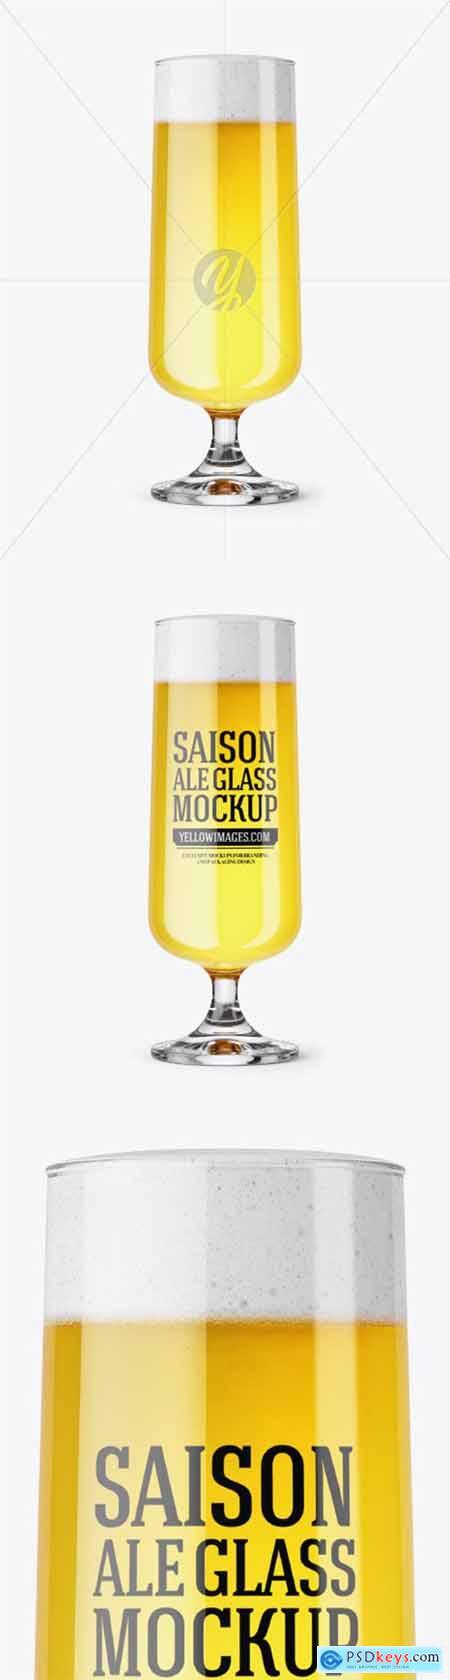 Goblet Glass with Saison Ale Mockup 51201